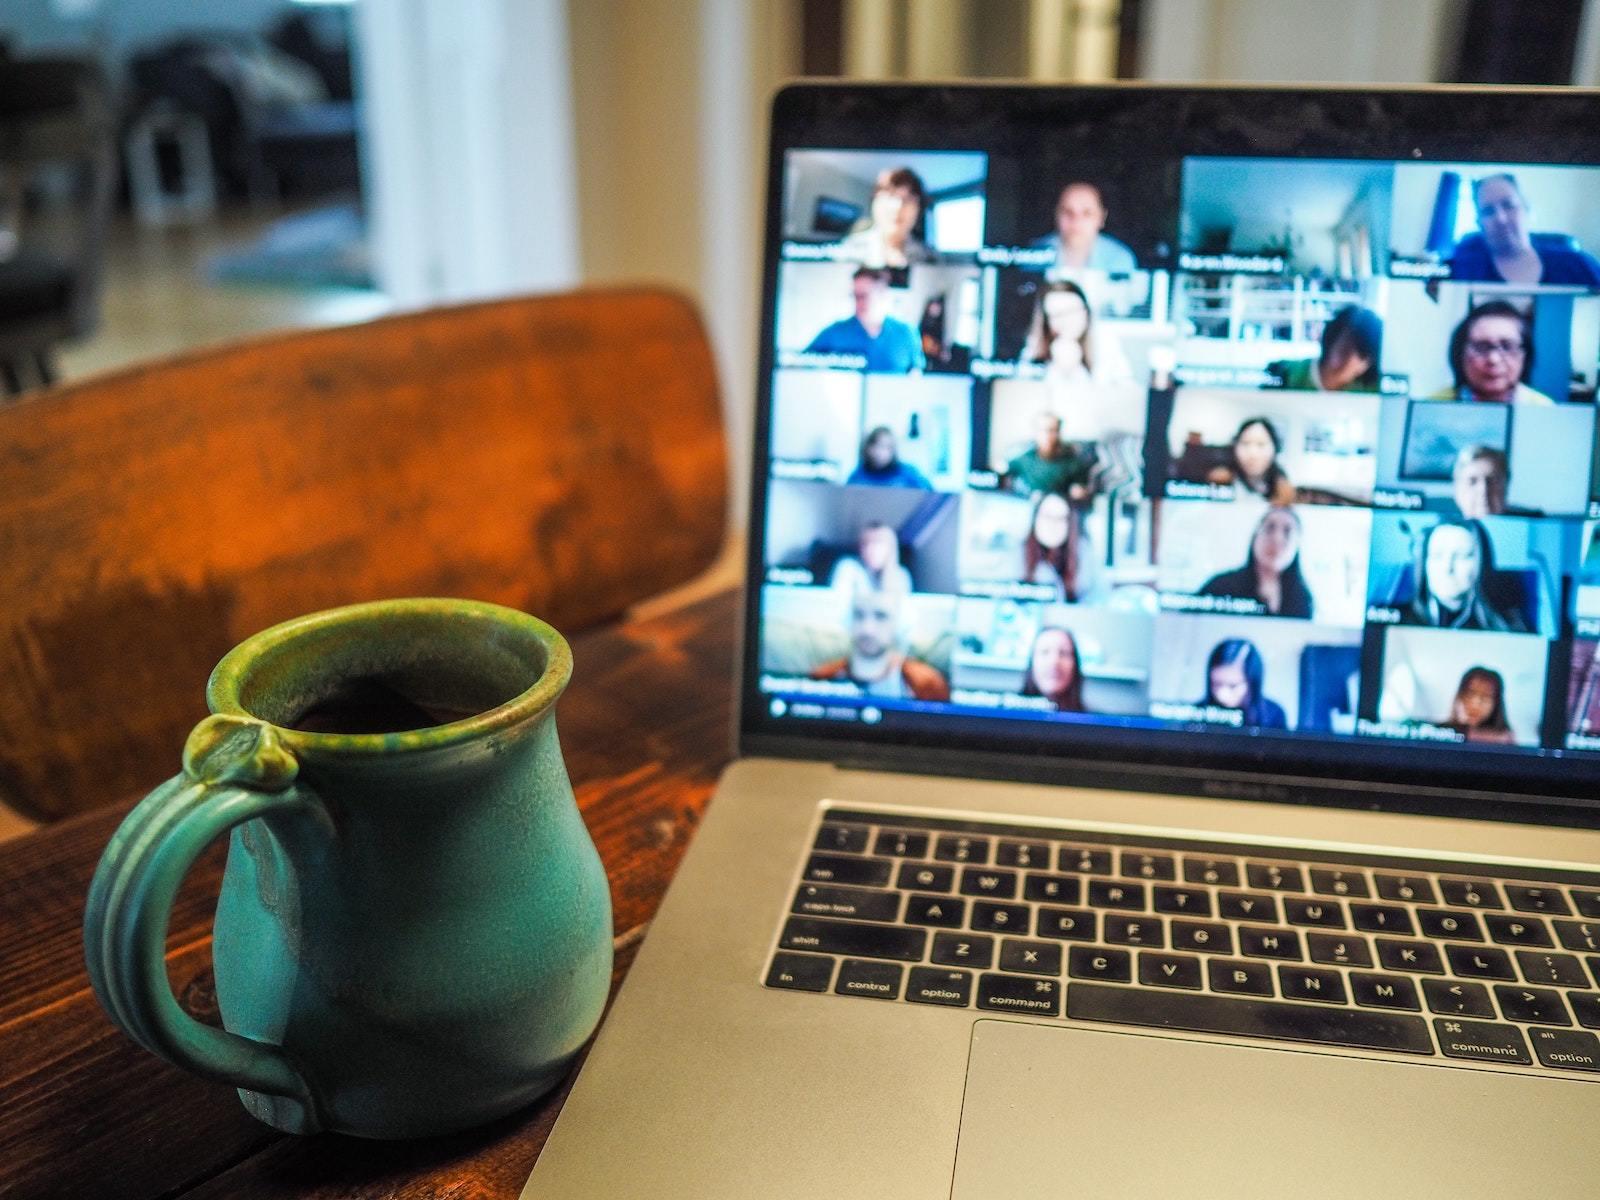 virtual meeting on a laptop next to a blue coffee mug